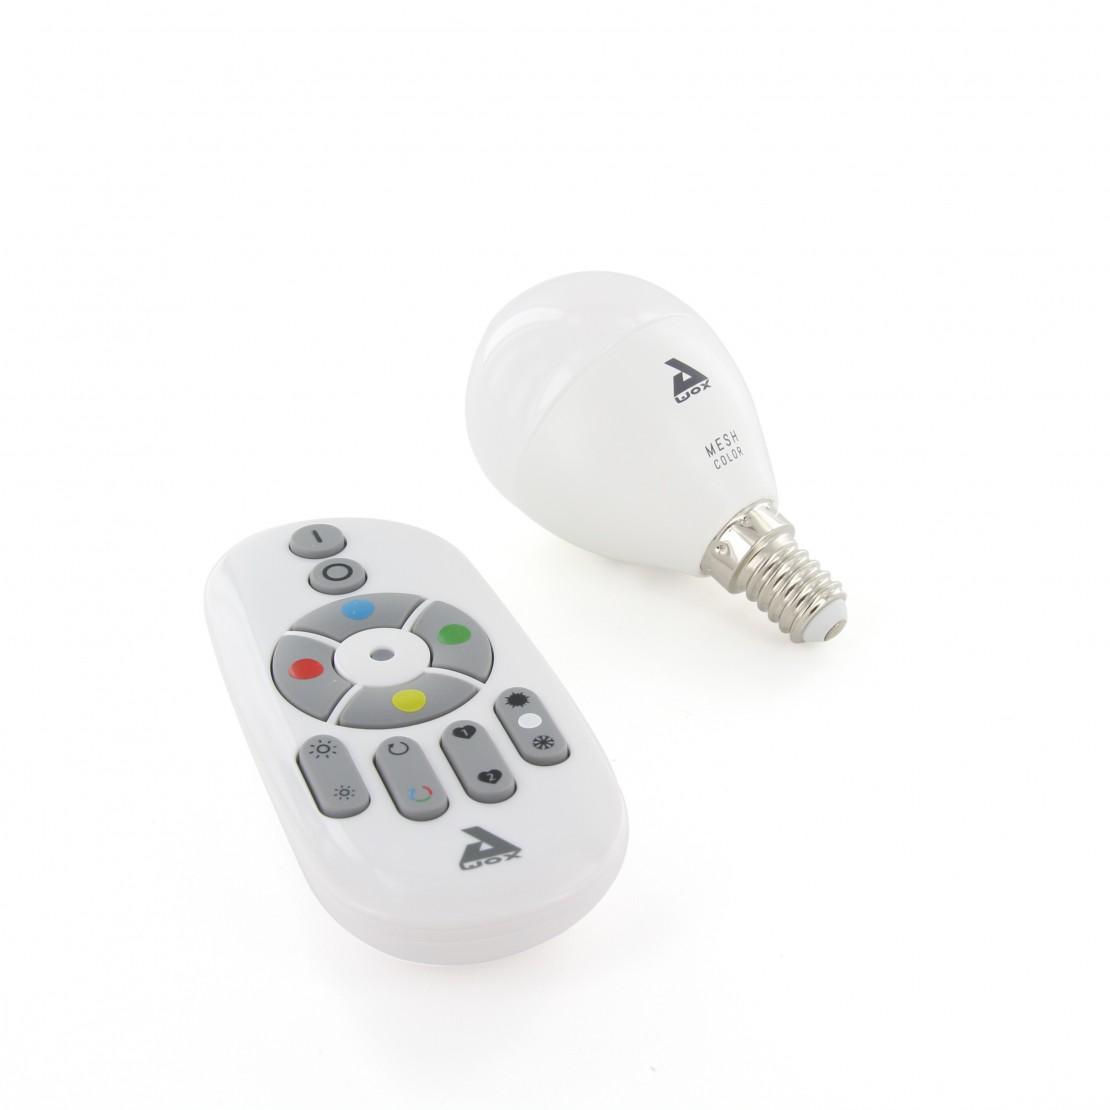 Set of colour E14 Bluetooth Mesh bulb and remote control